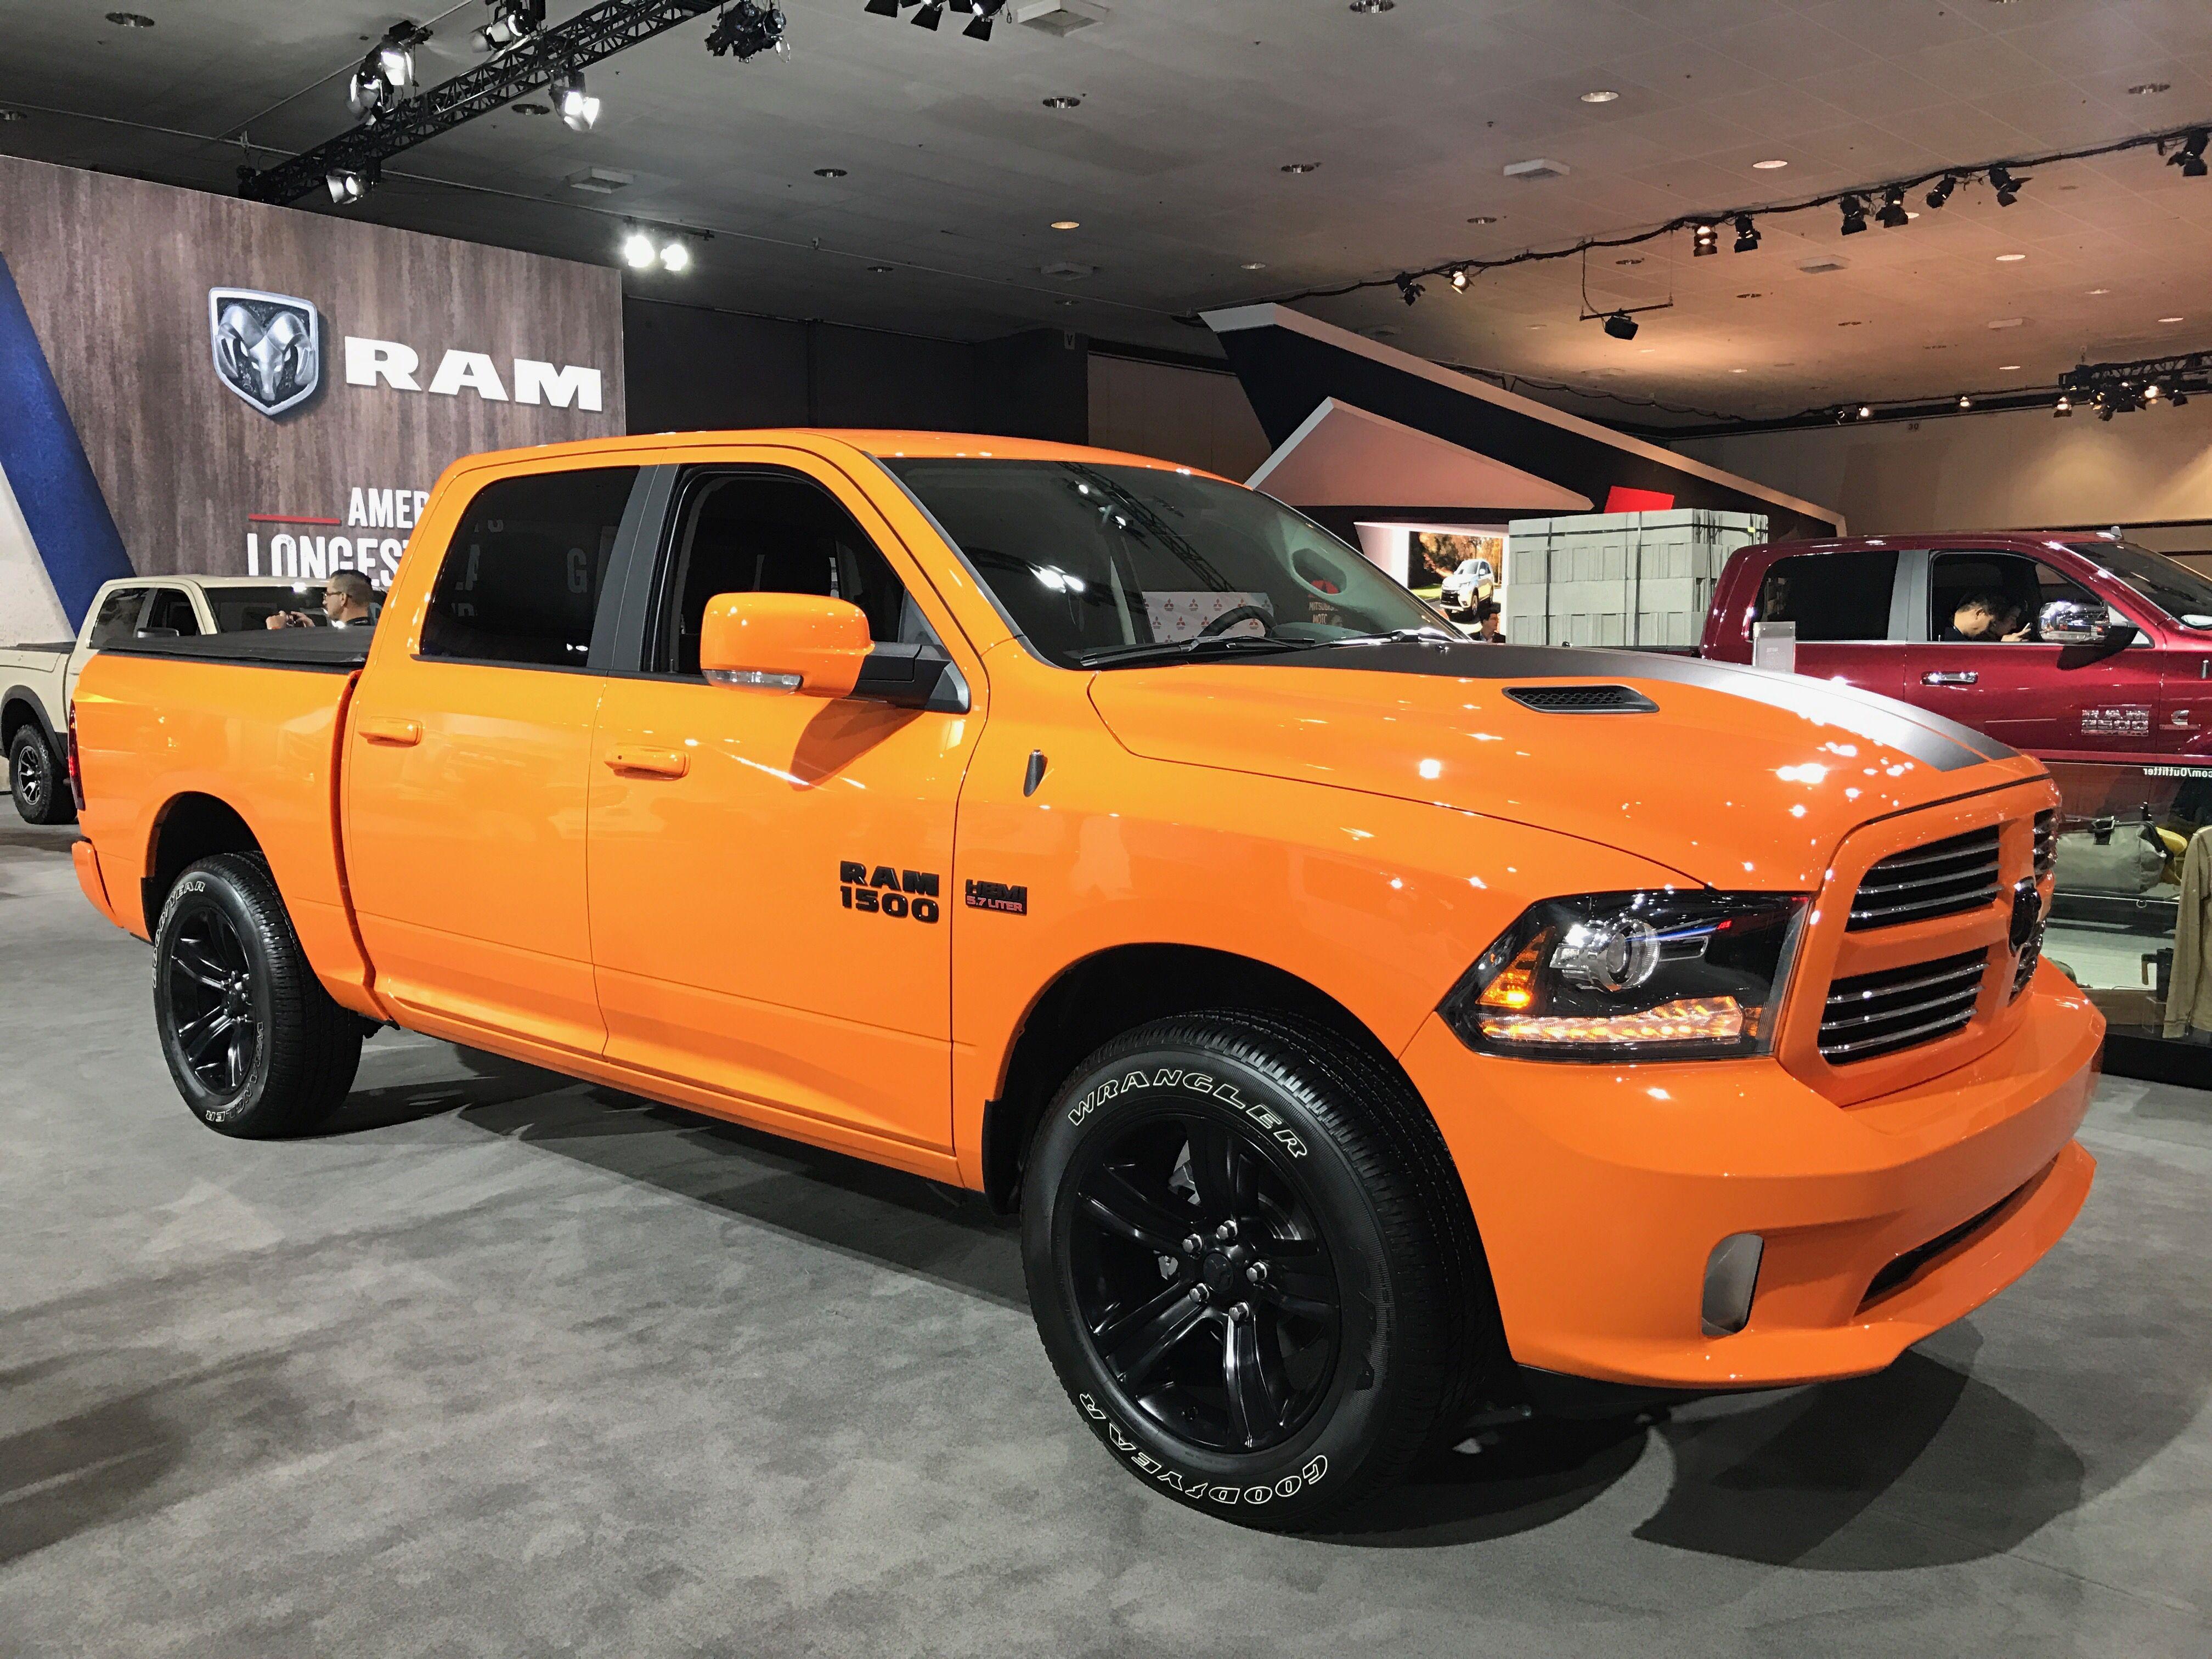 2017 ram 1500 ignition orange 5 7l hemi laautoshow trucks trucks pinterest. Black Bedroom Furniture Sets. Home Design Ideas